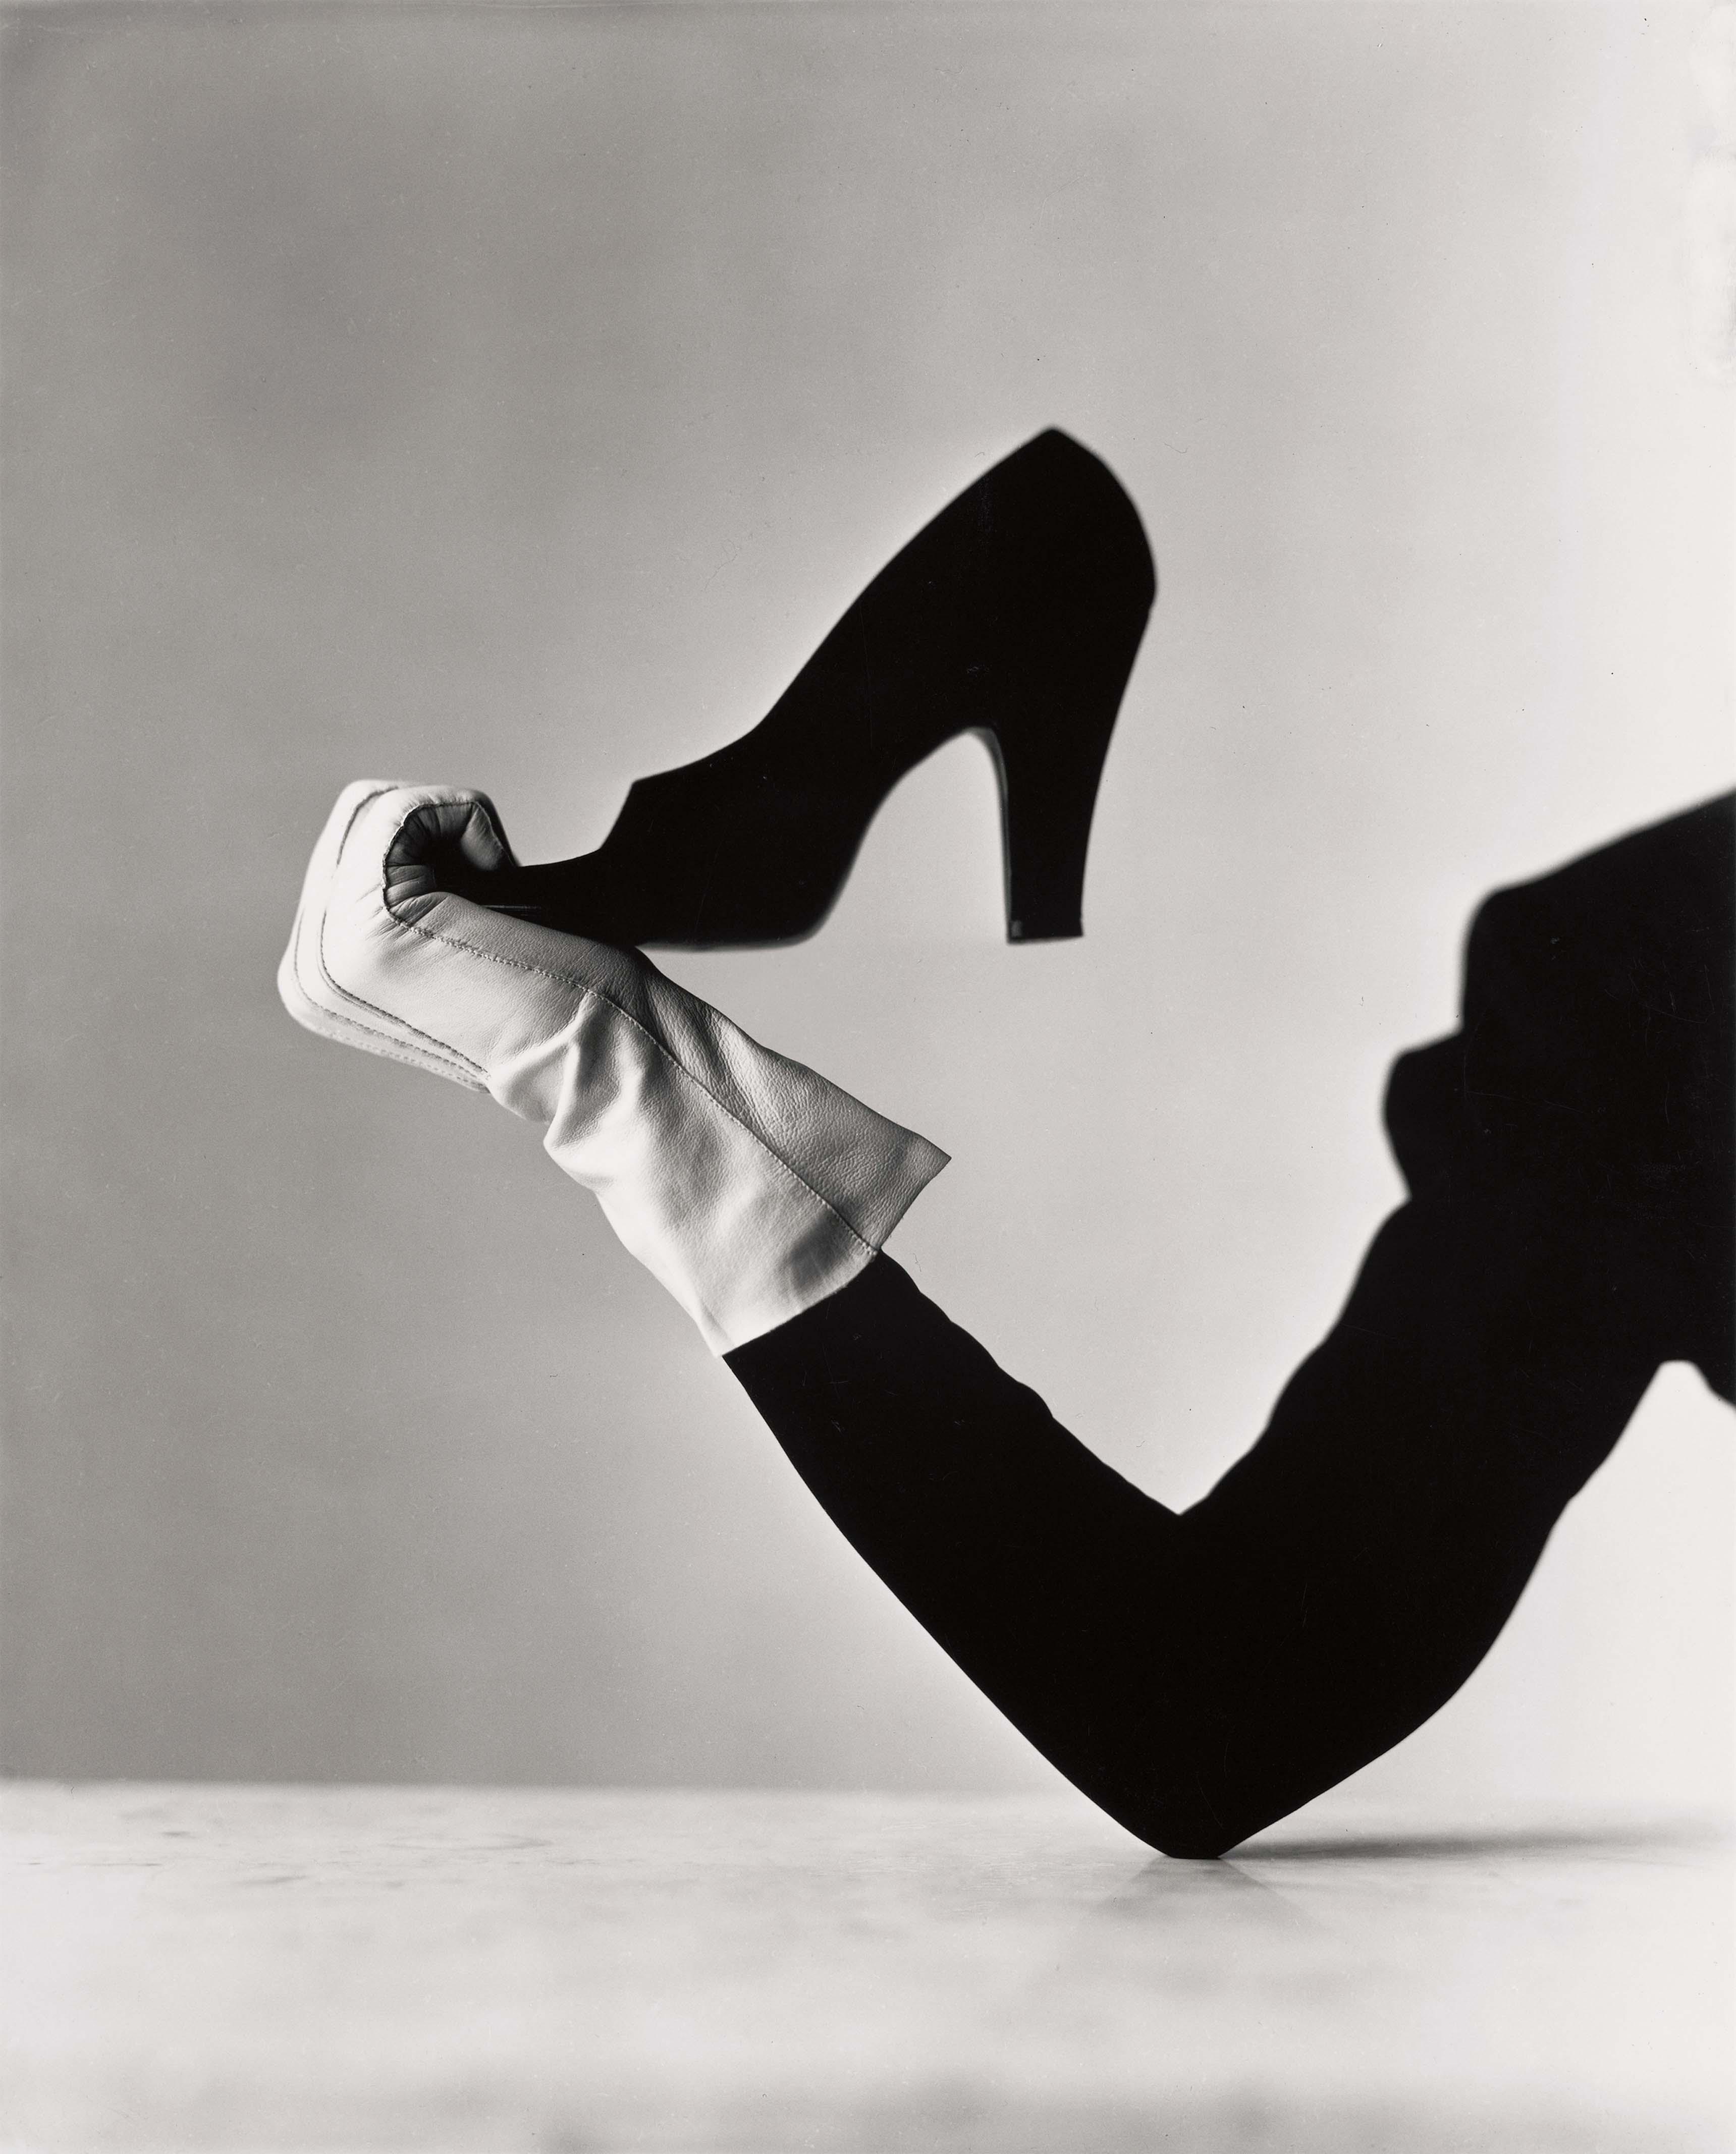 Glove and Shoe, New York, 1947. Epreuve gélatino-argentique, 24,4 x 19,7 cm.